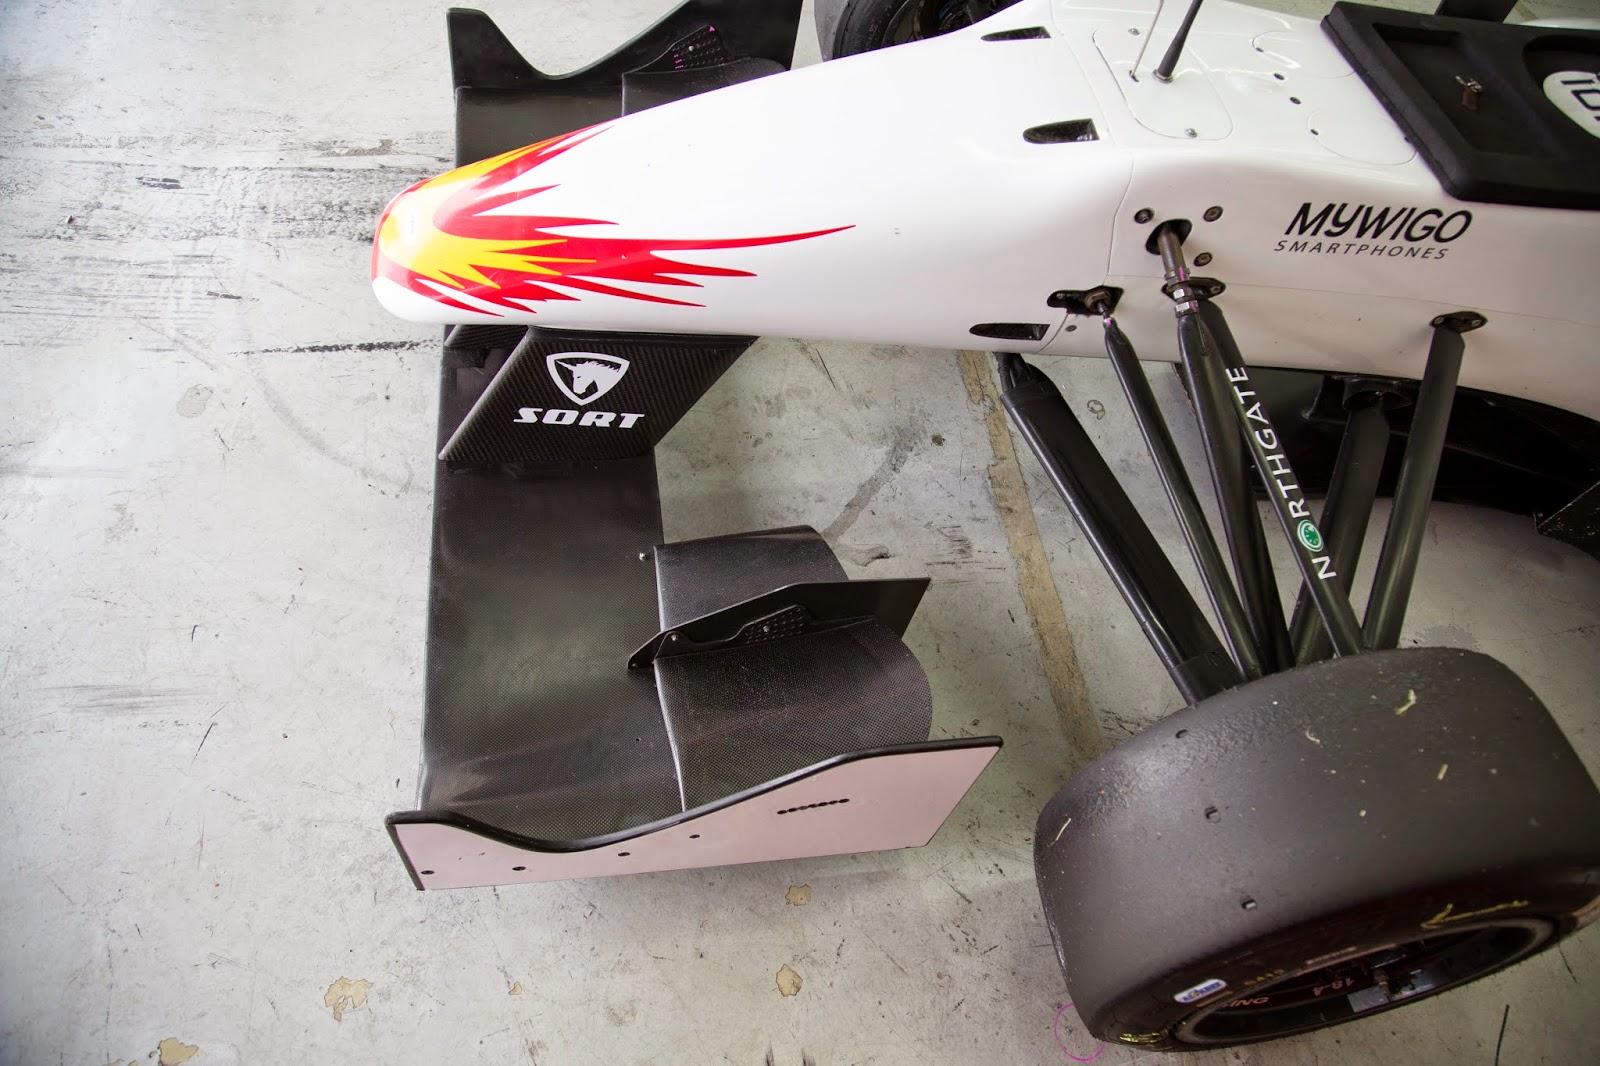 Campos Racing, EuroFormula Open, Formula 3, F3, F1